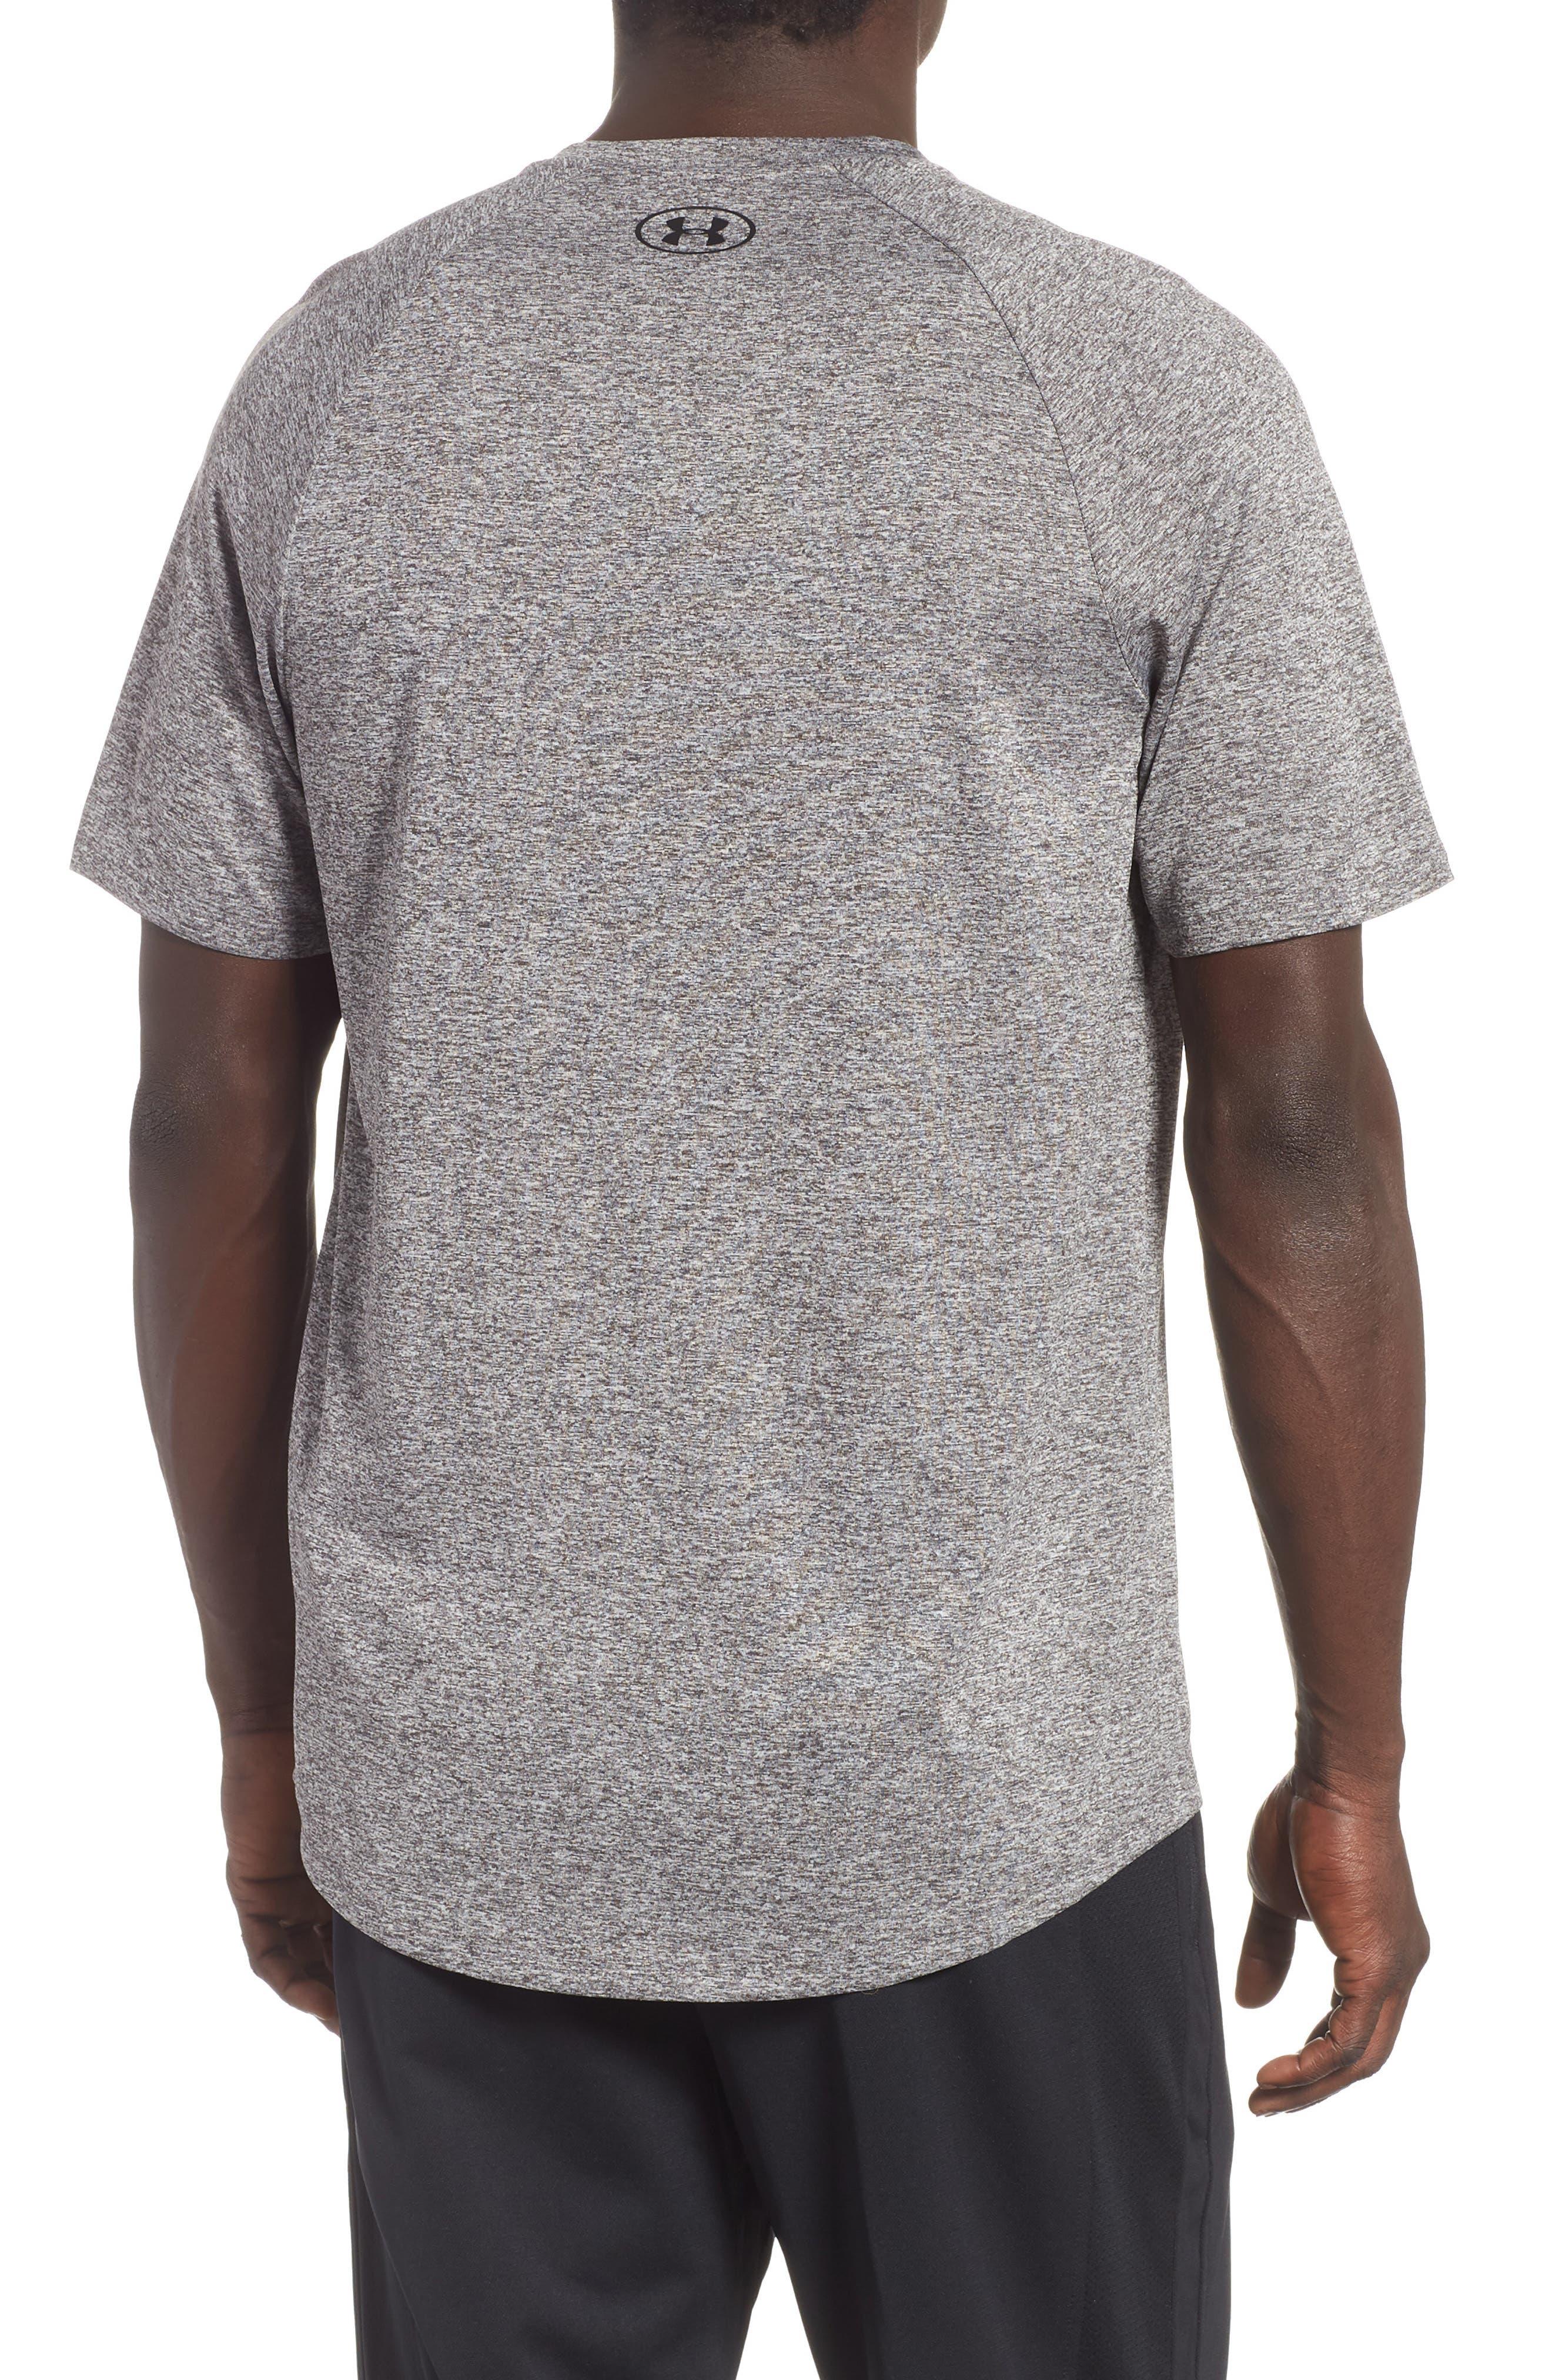 UA Tech<sup>™</sup> T-Shirt,                             Alternate thumbnail 2, color,                             CHARCOAL LIGHT HEATHER